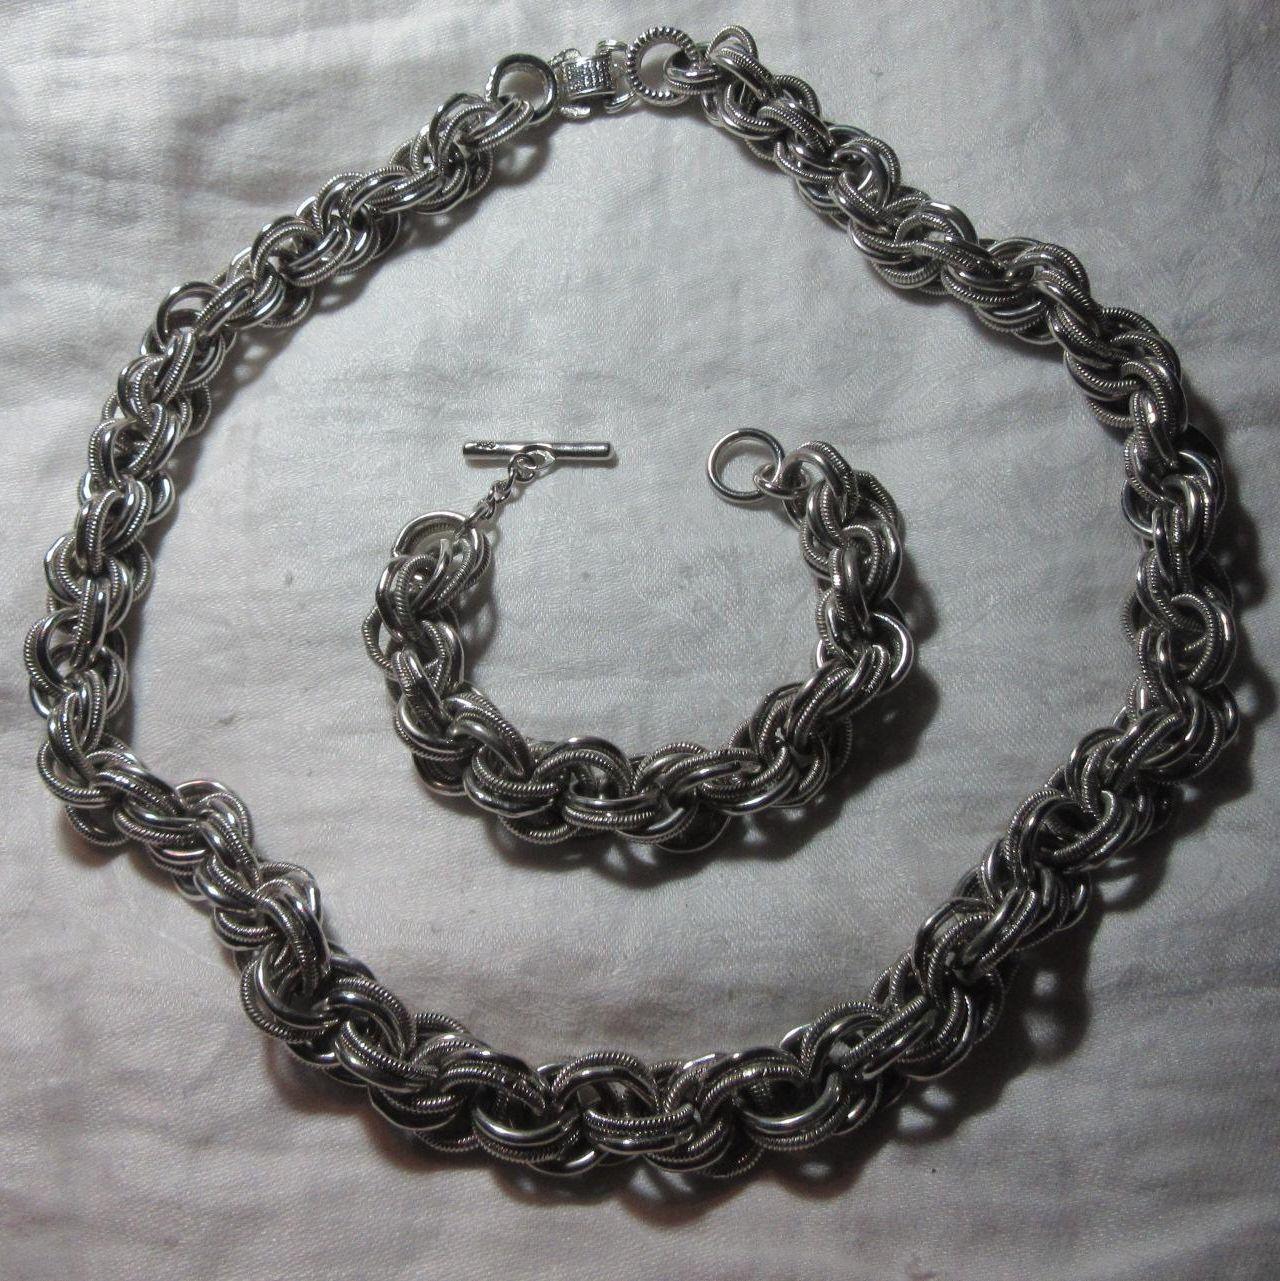 Coro Silver Tone Metal Necklace Bracelet Set